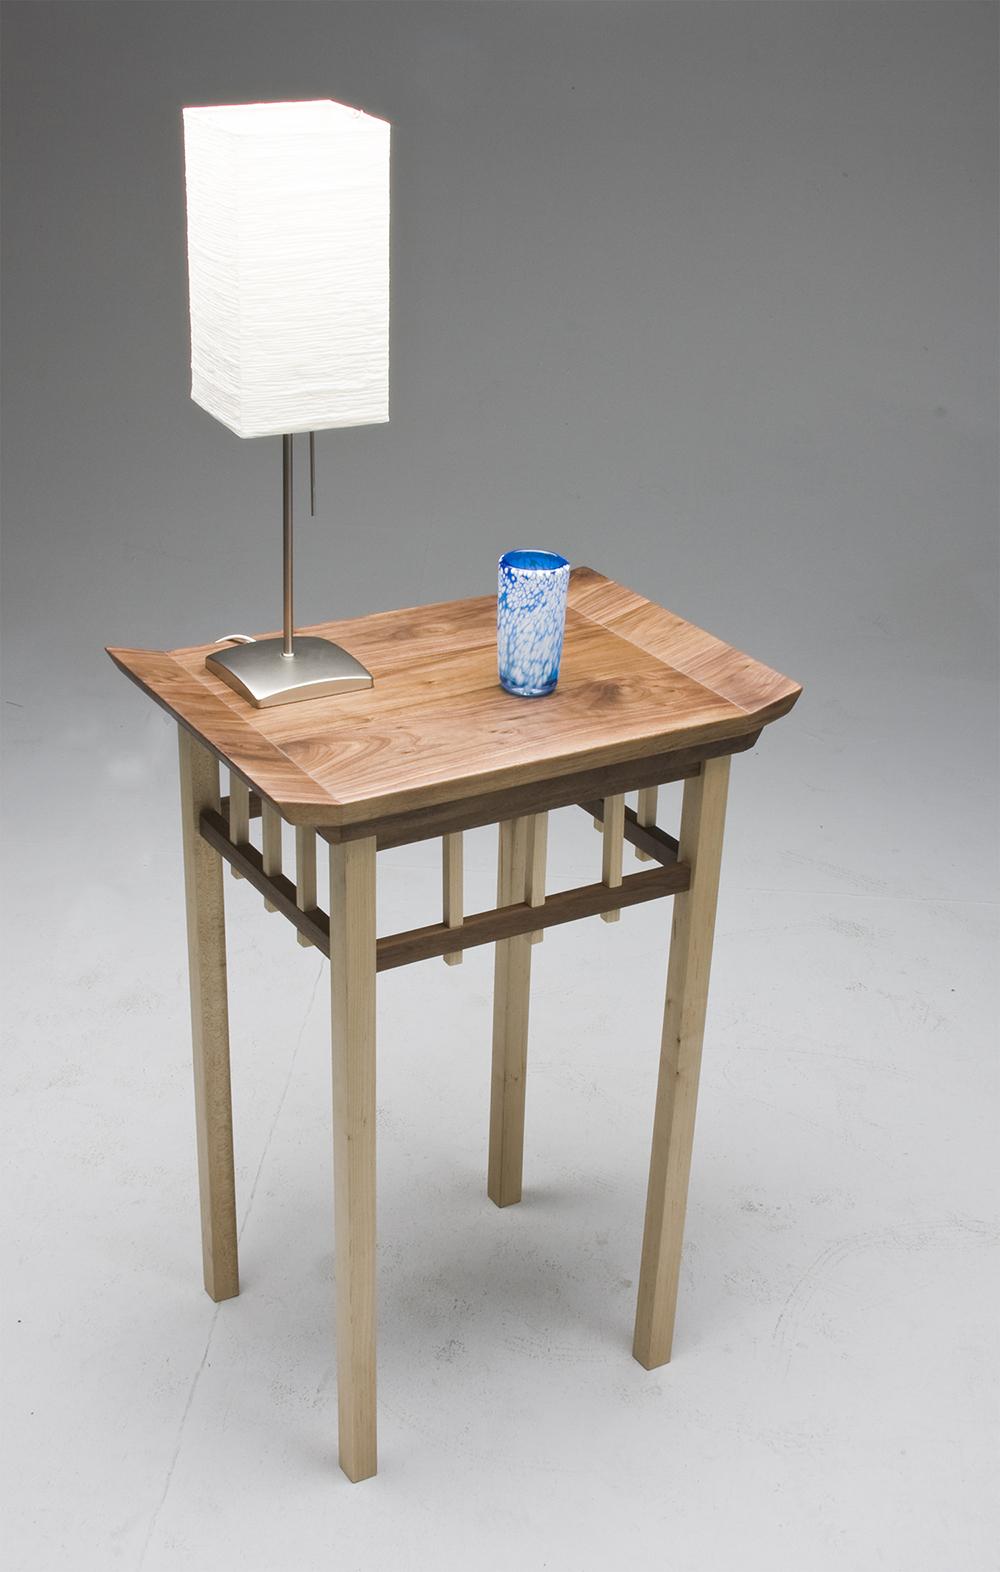 Furniture_Nightstand_SFortner_2.jpg